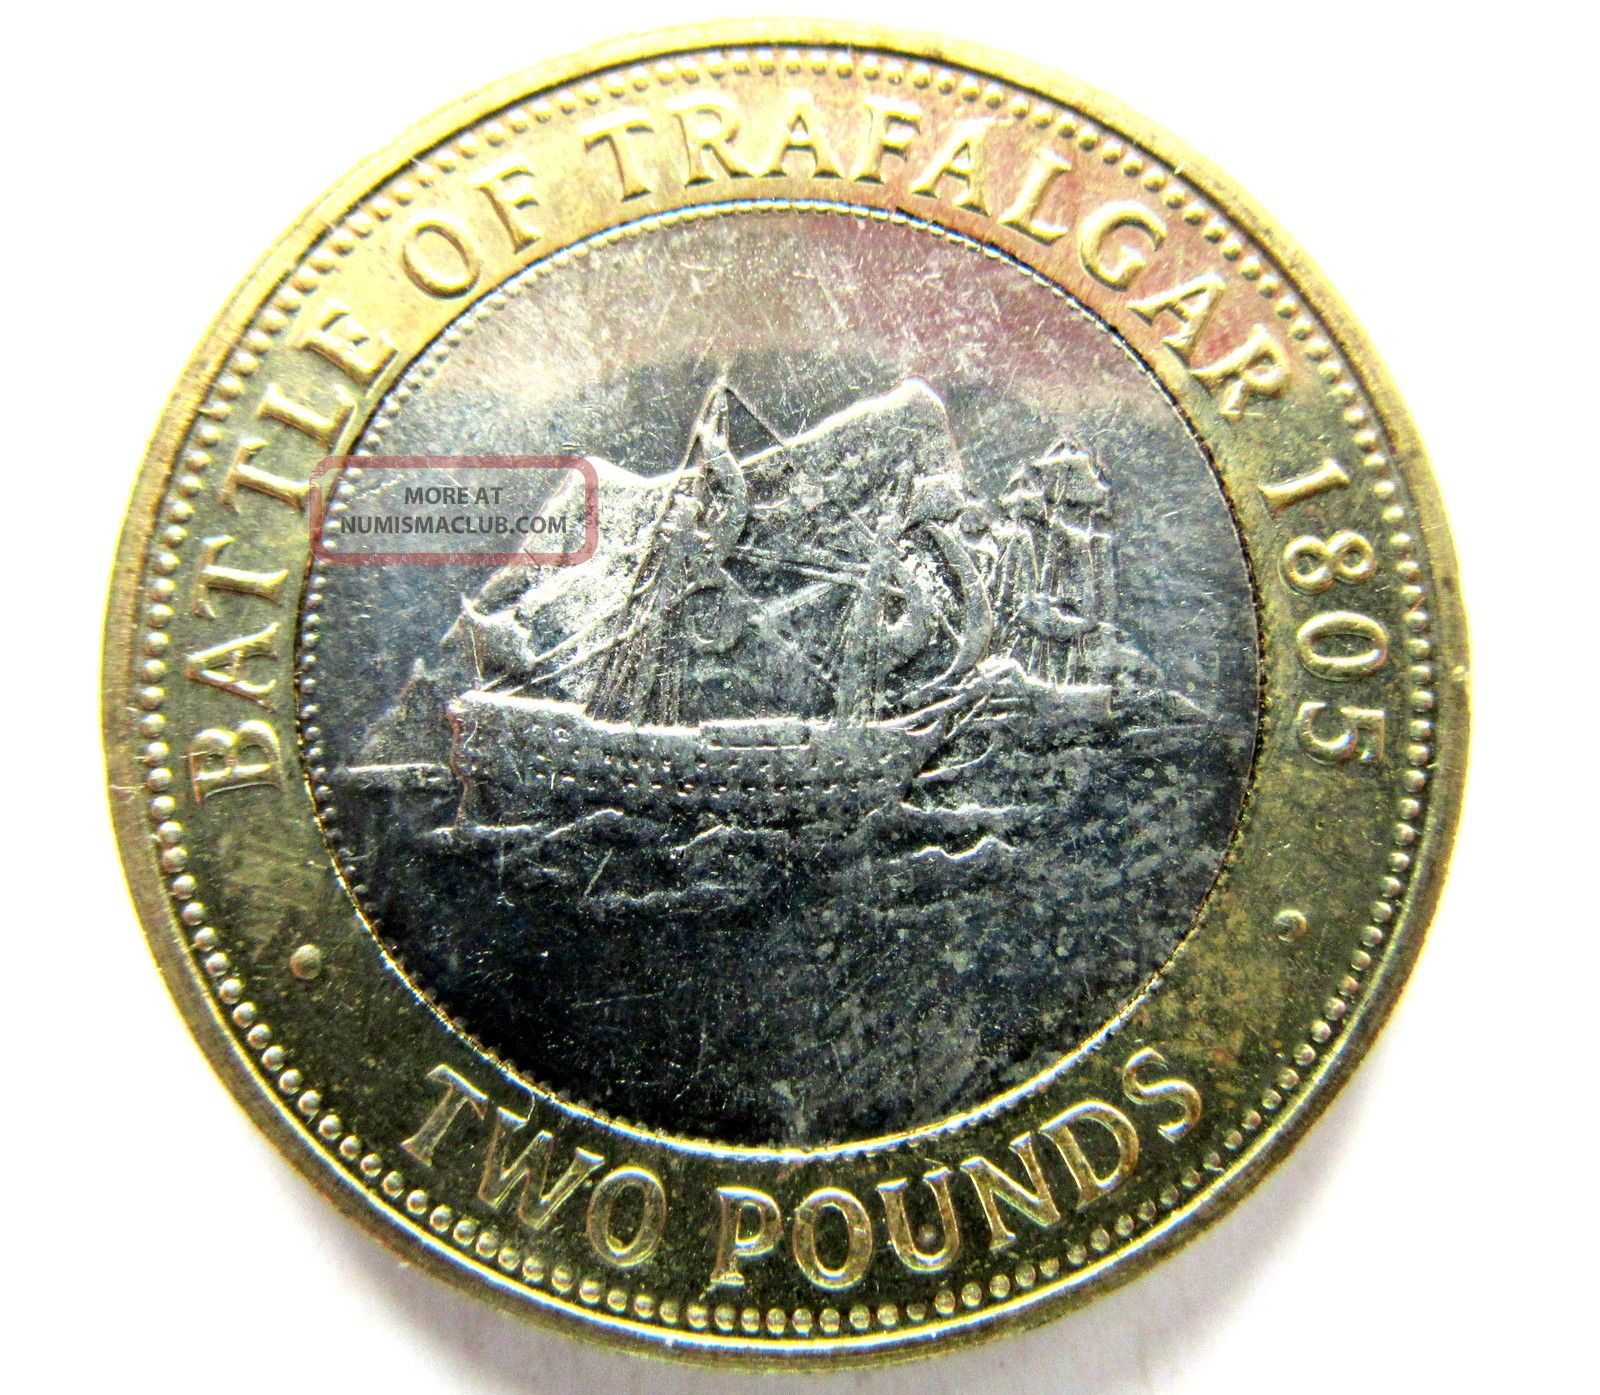 Gibraltar 2007 2 Pounds,  Battle Of Trafalgar Bicentenary 1805,  Sail Ship,  Unc Europe photo